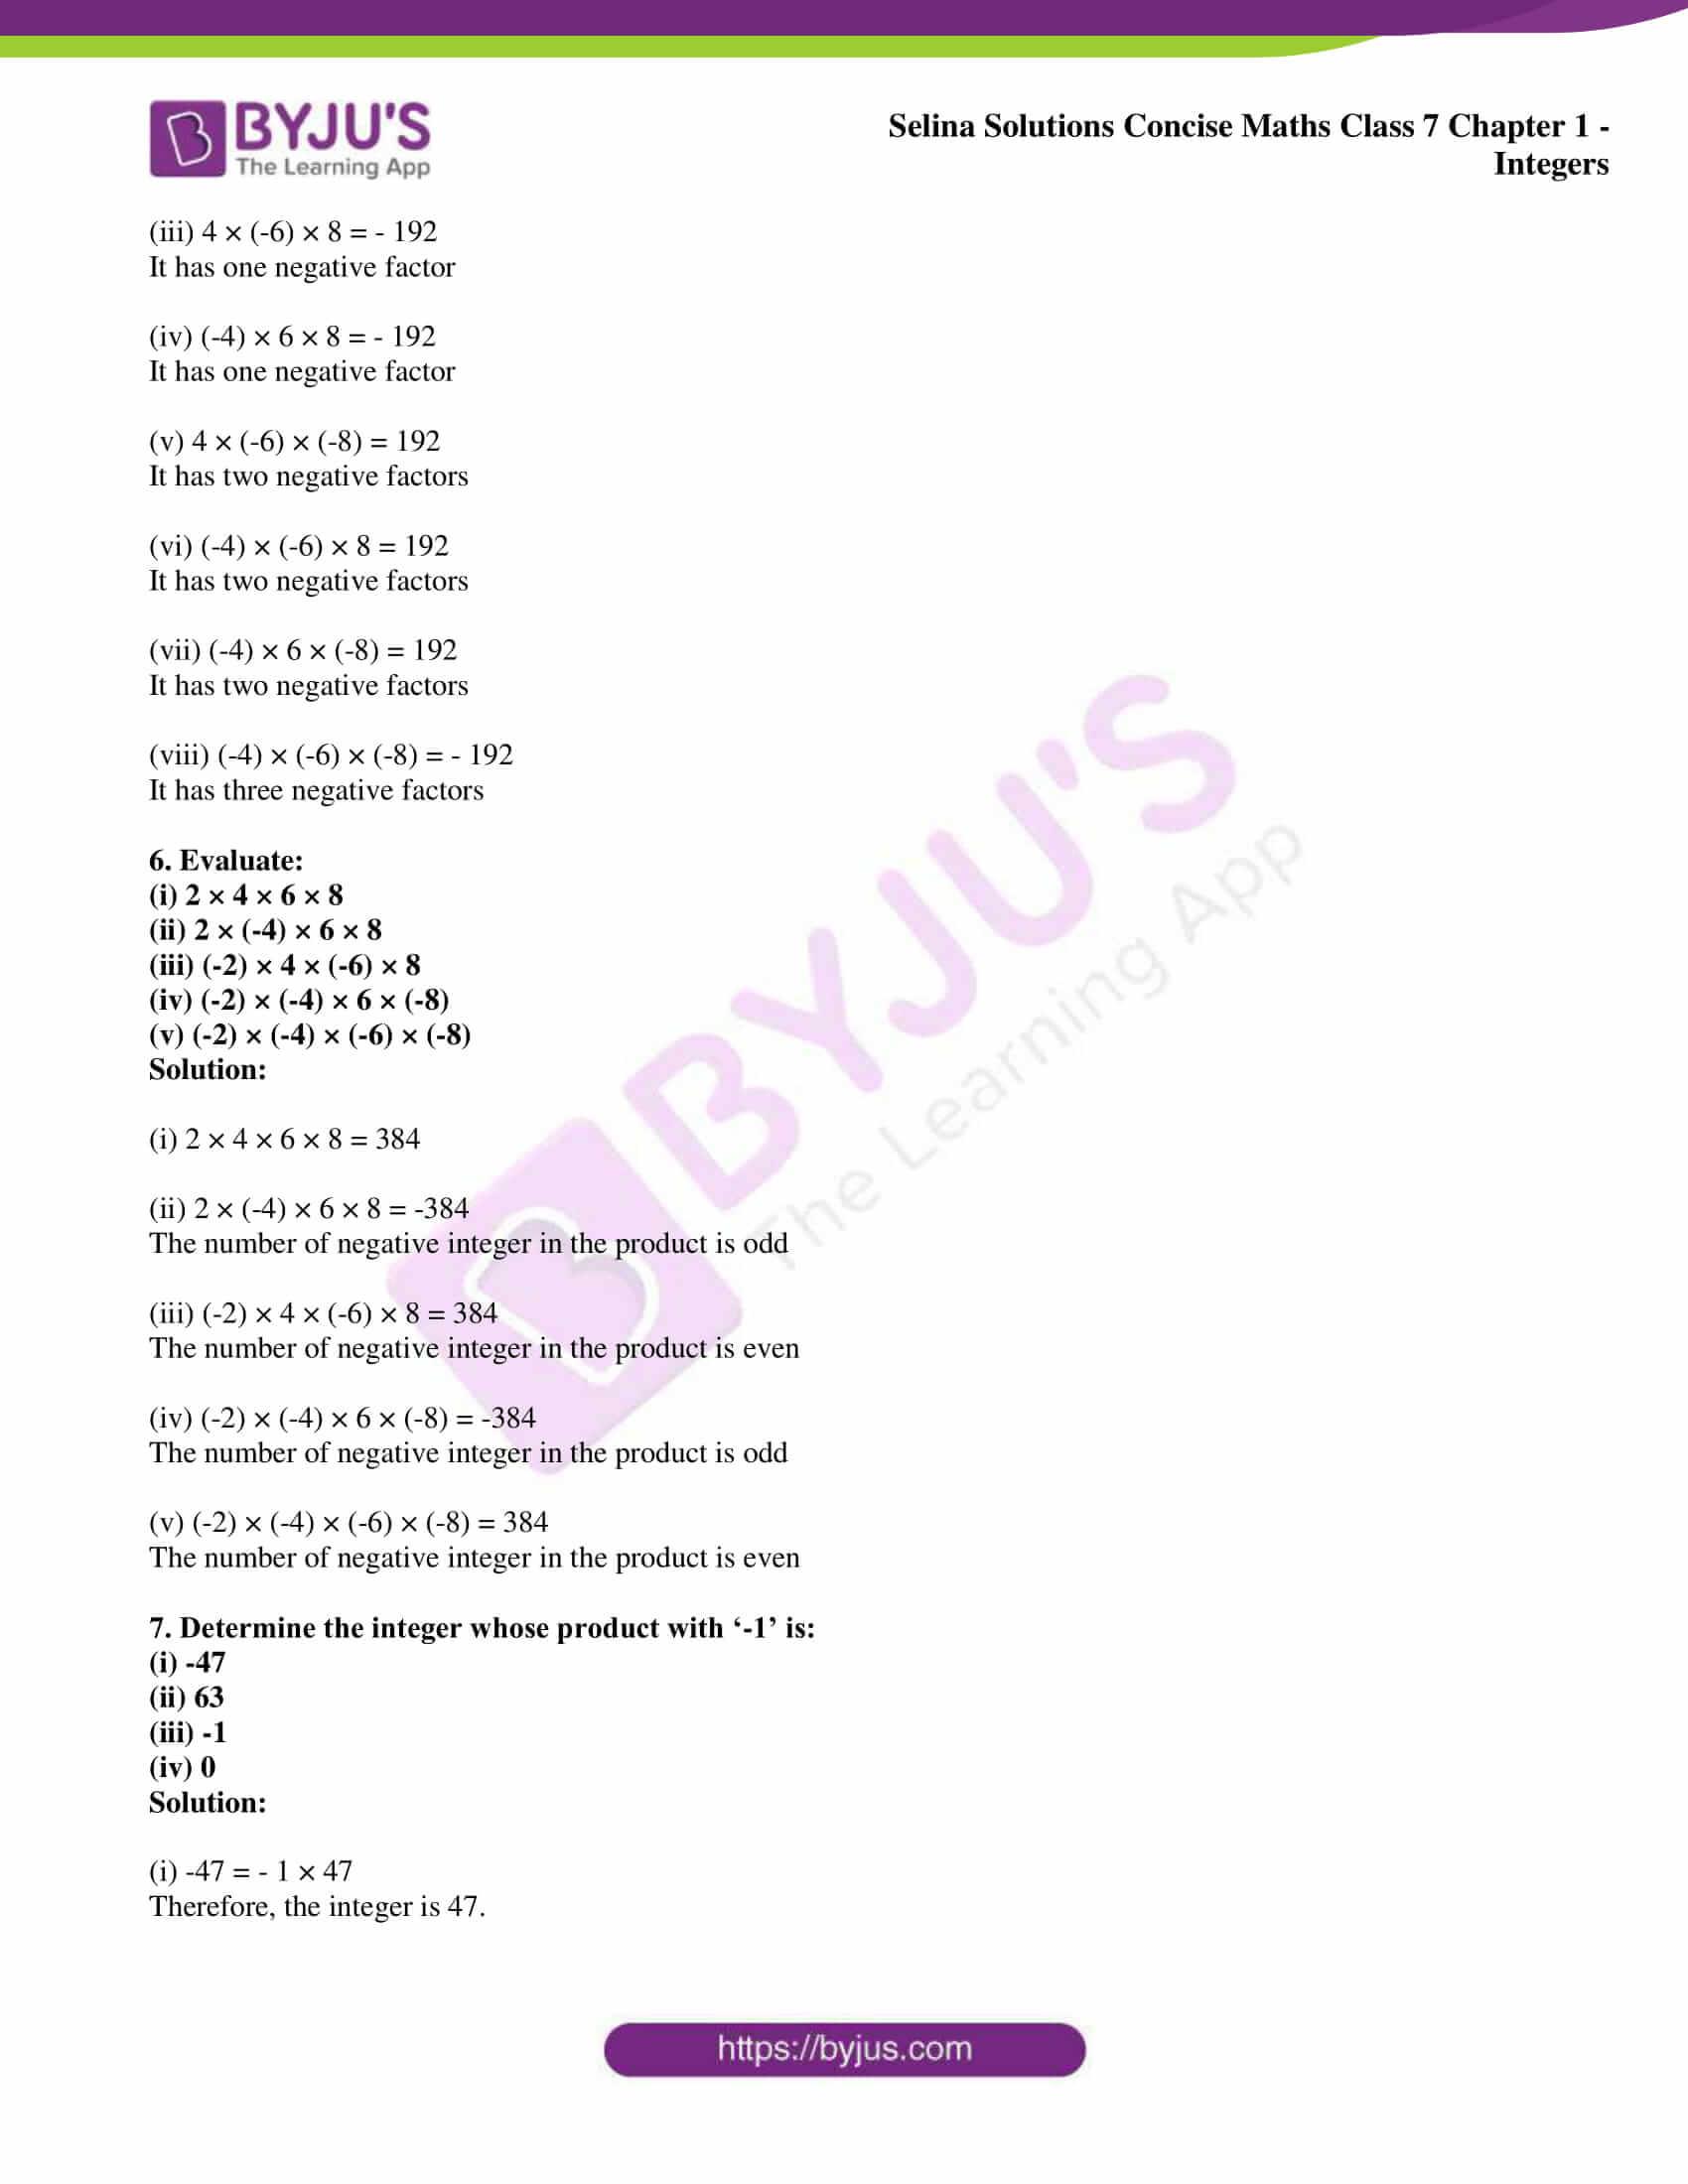 selina sol concise maths class 7 ch1 ex 1a 4